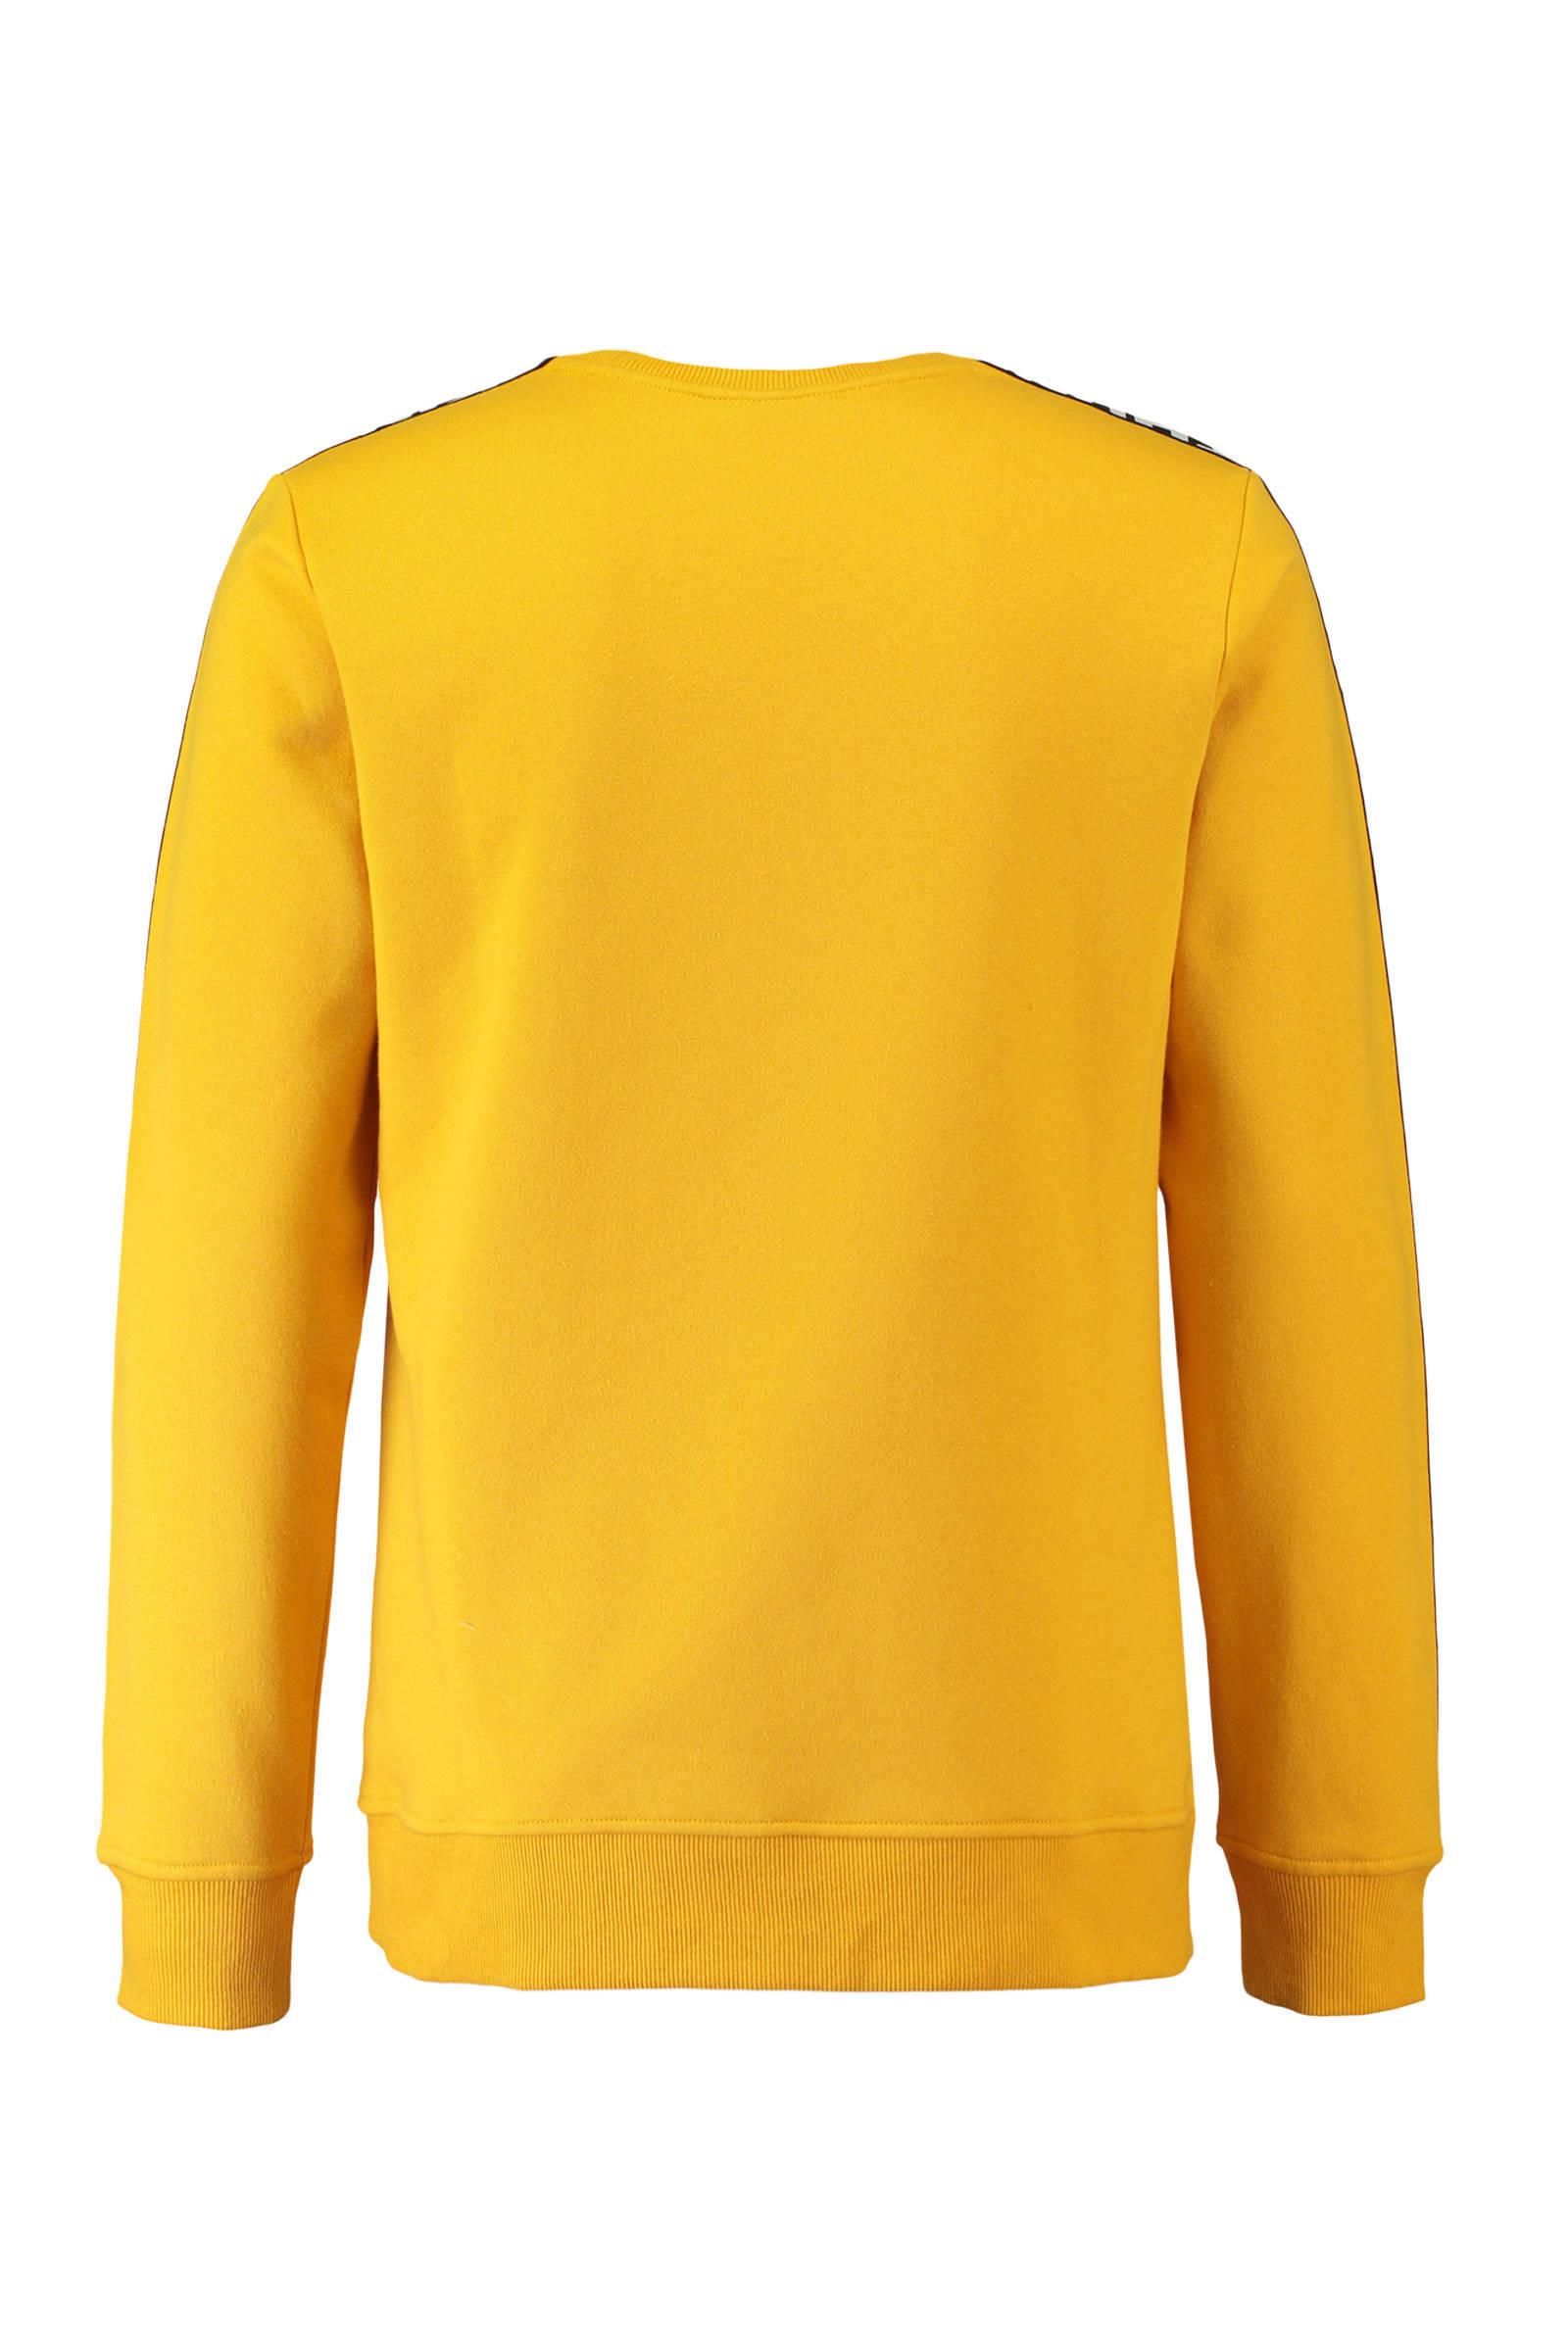 tekst sweater CoolCat CoolCat sweater met 0waq7XnR4